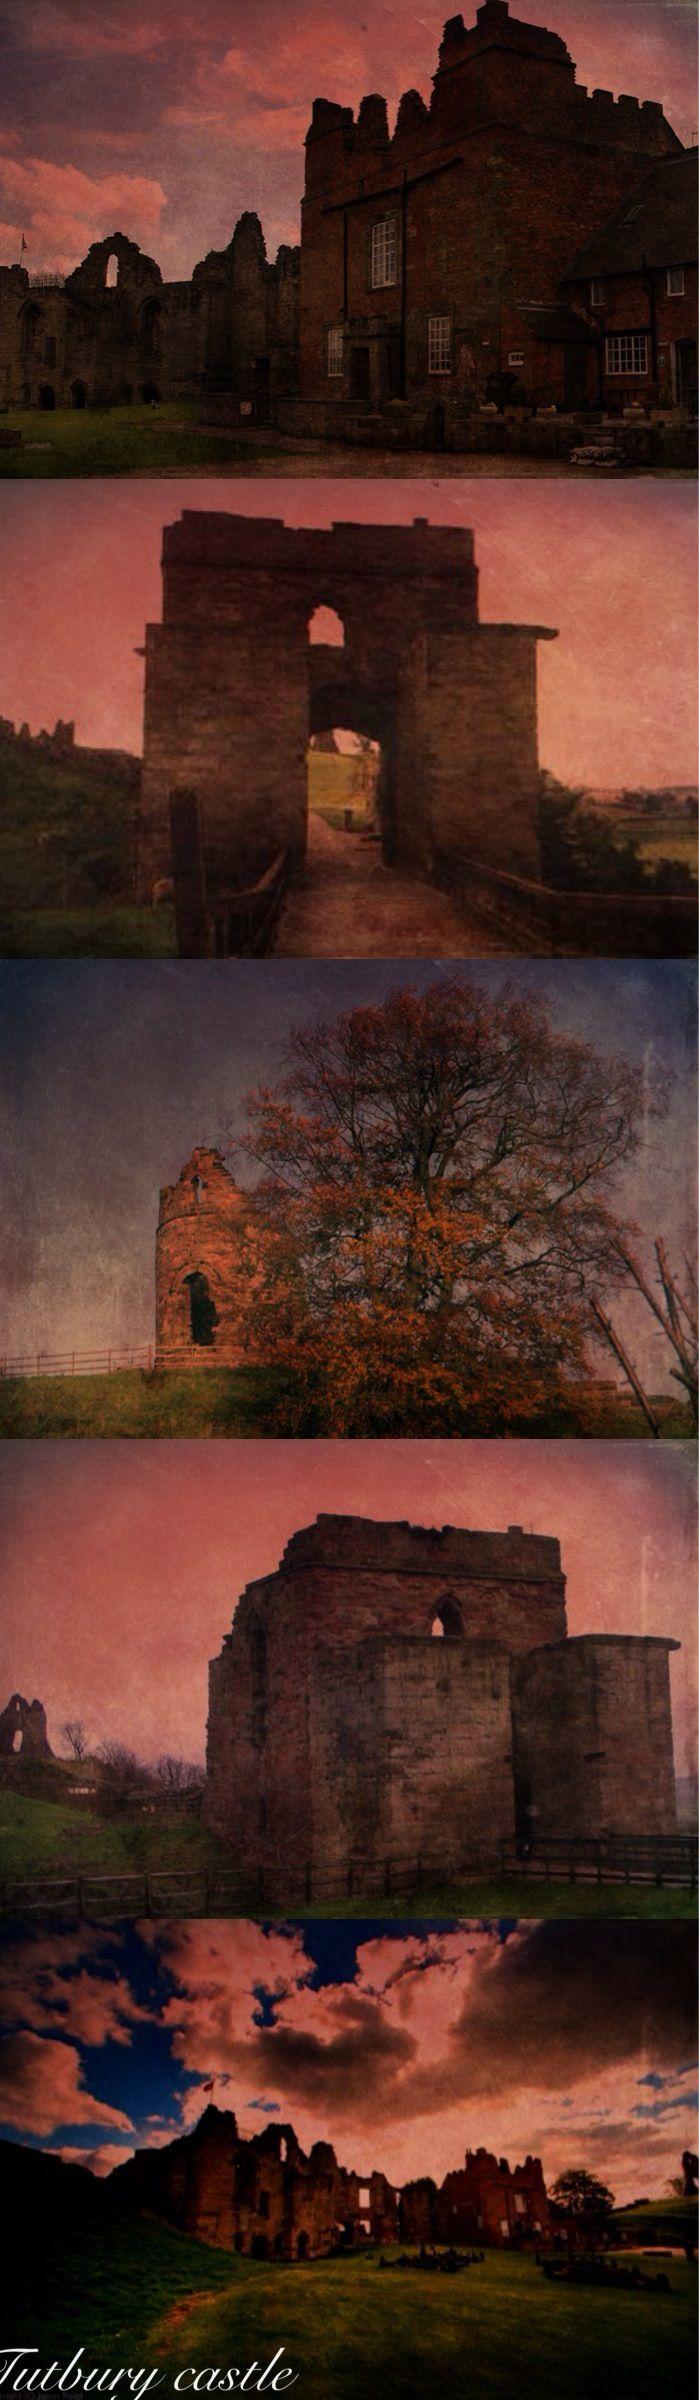 England Tutbury Castle Mary Queen Of Scots Haunts The